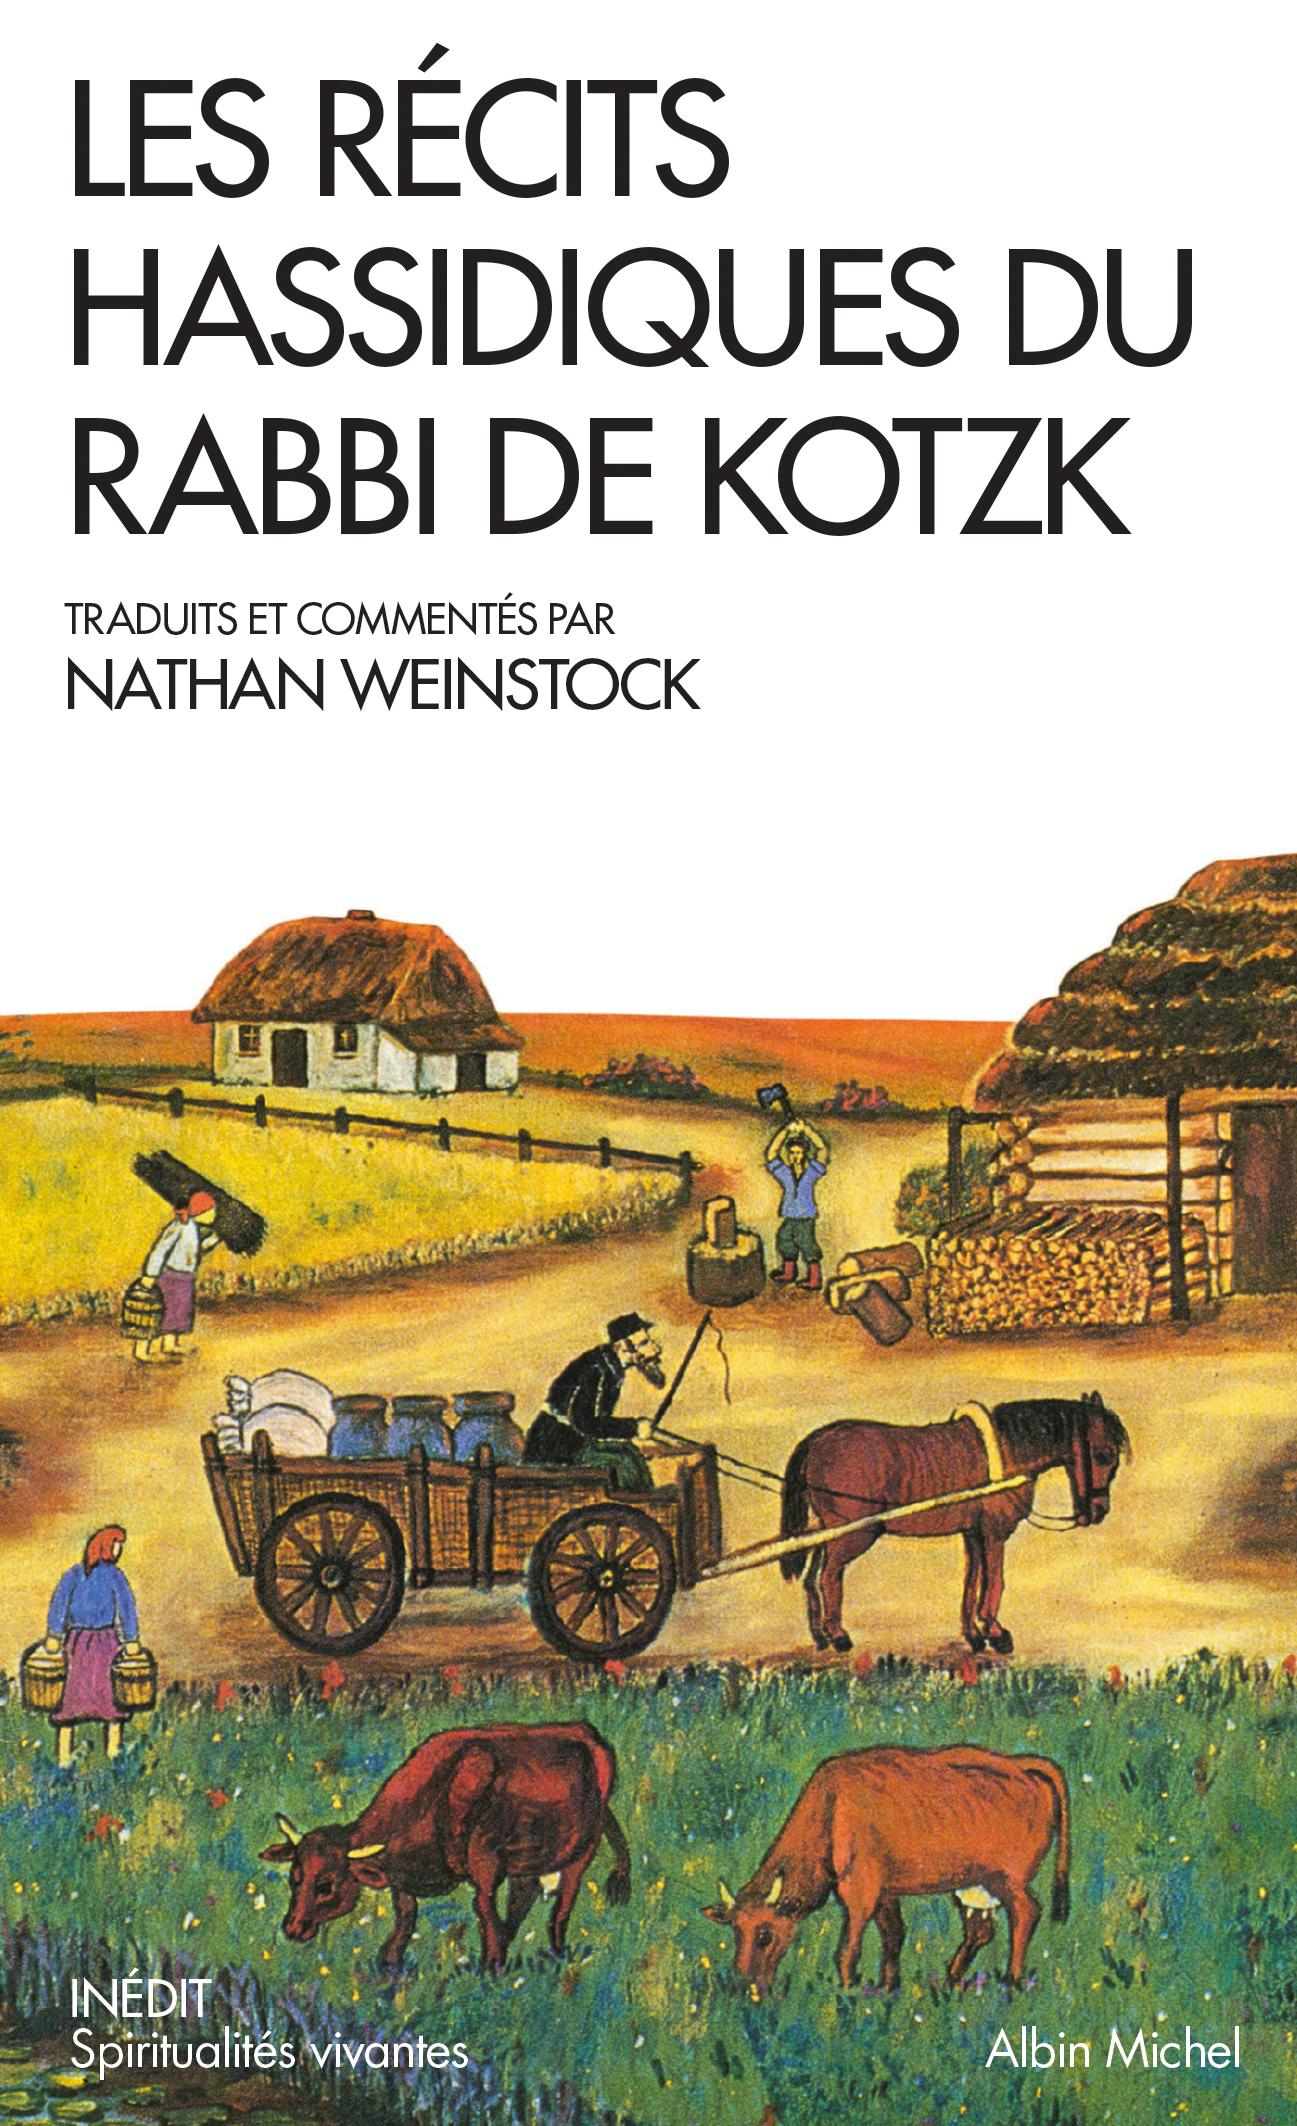 Les récits hassidiques du rabbi de Kotzk